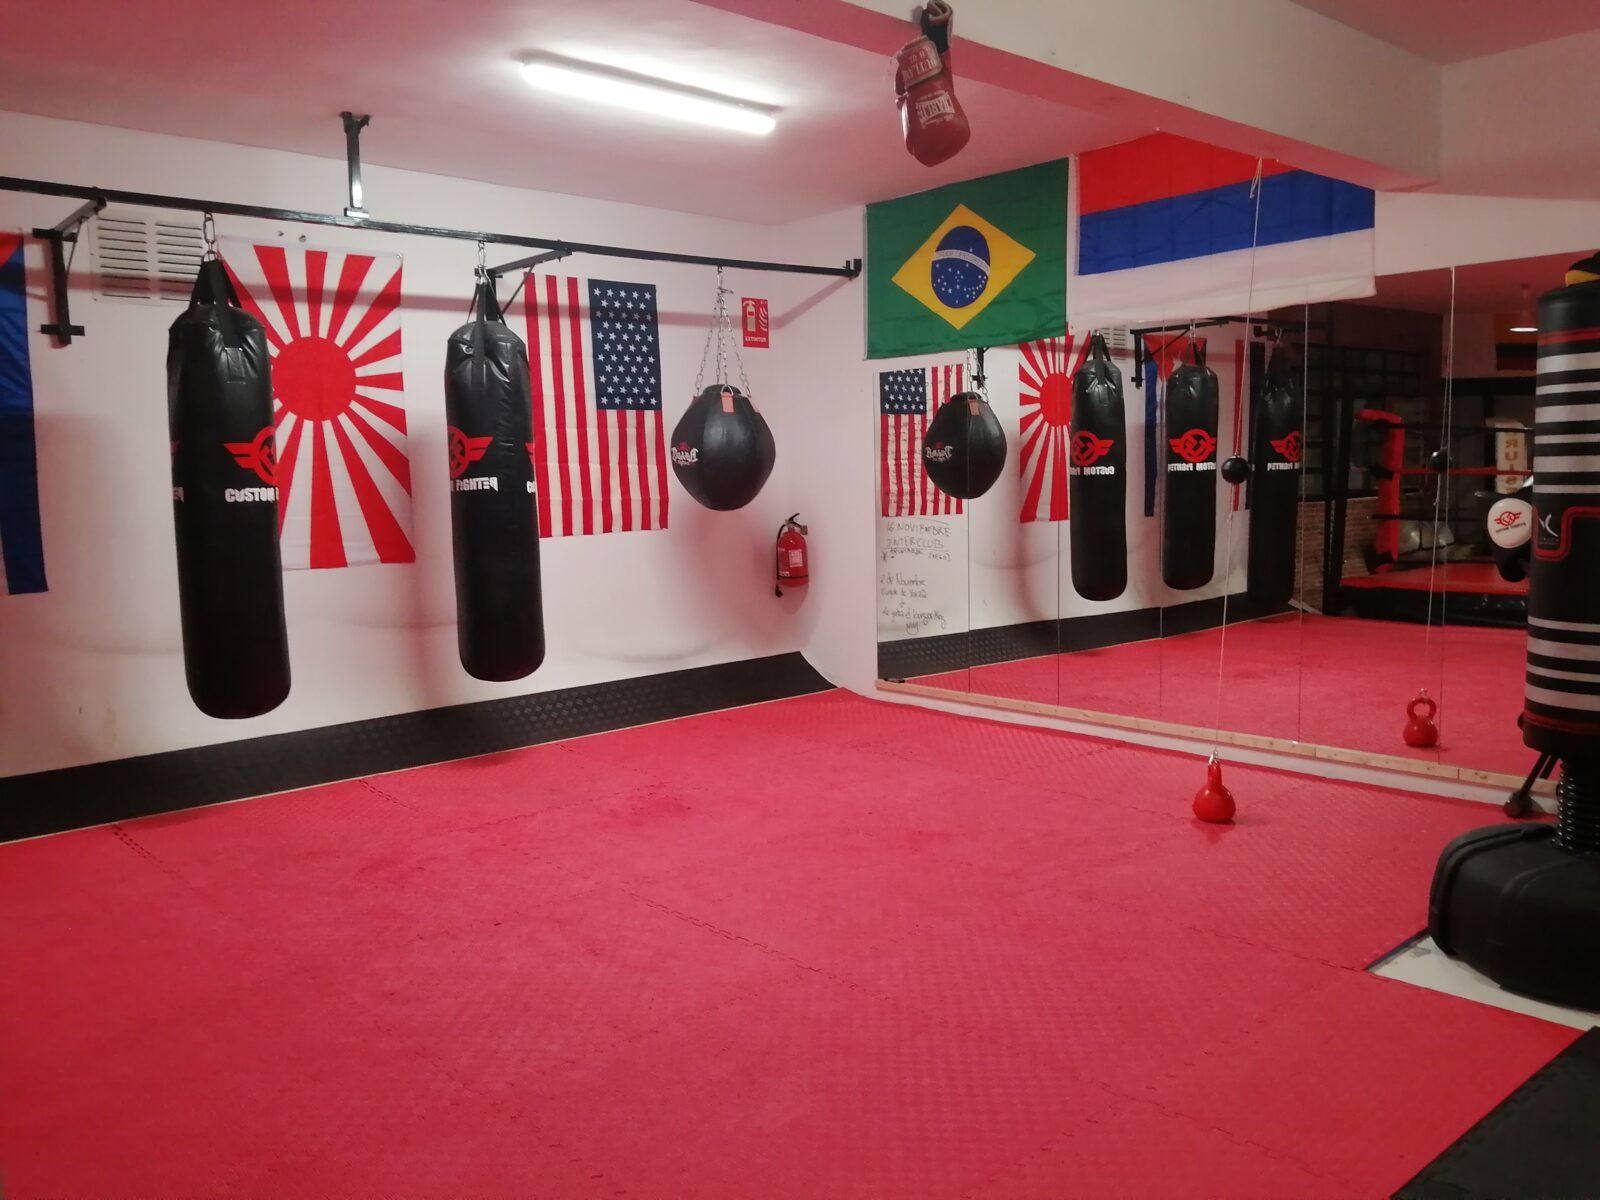 boxeo sa fight company